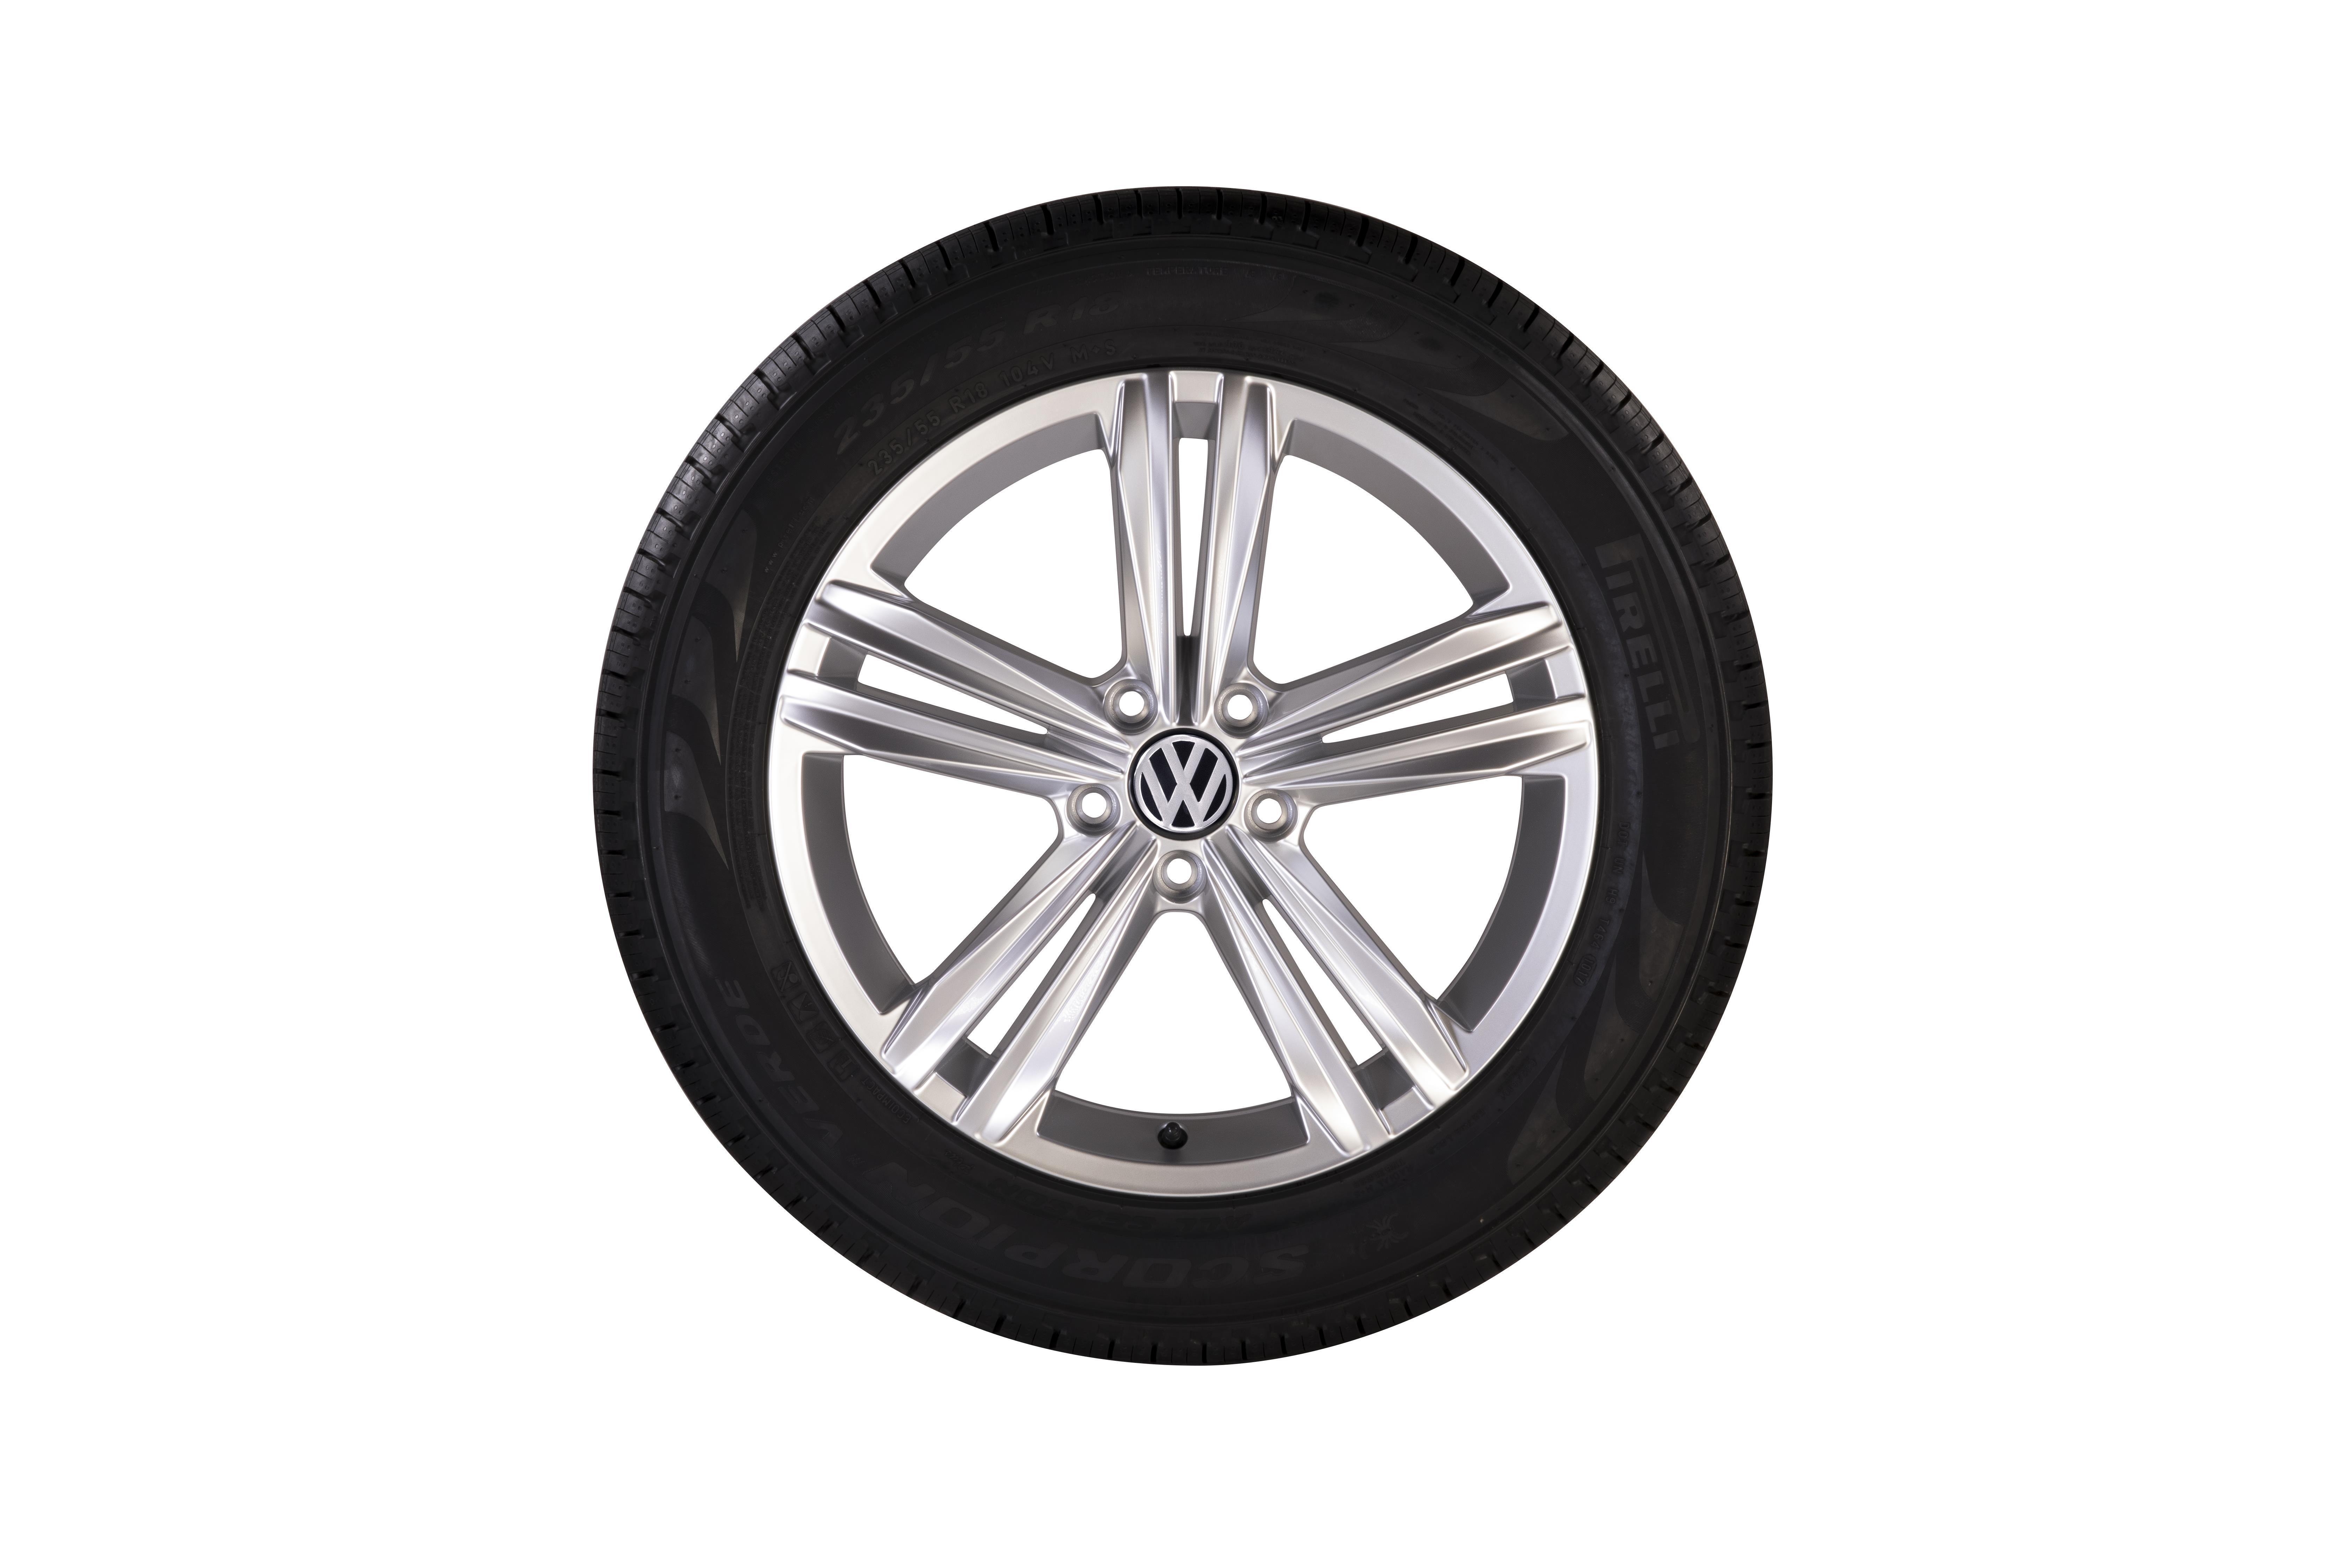 2018 volkswagen tiguan roues trenton de 18 po gris galvanis m tallis pneu chaque. Black Bedroom Furniture Sets. Home Design Ideas